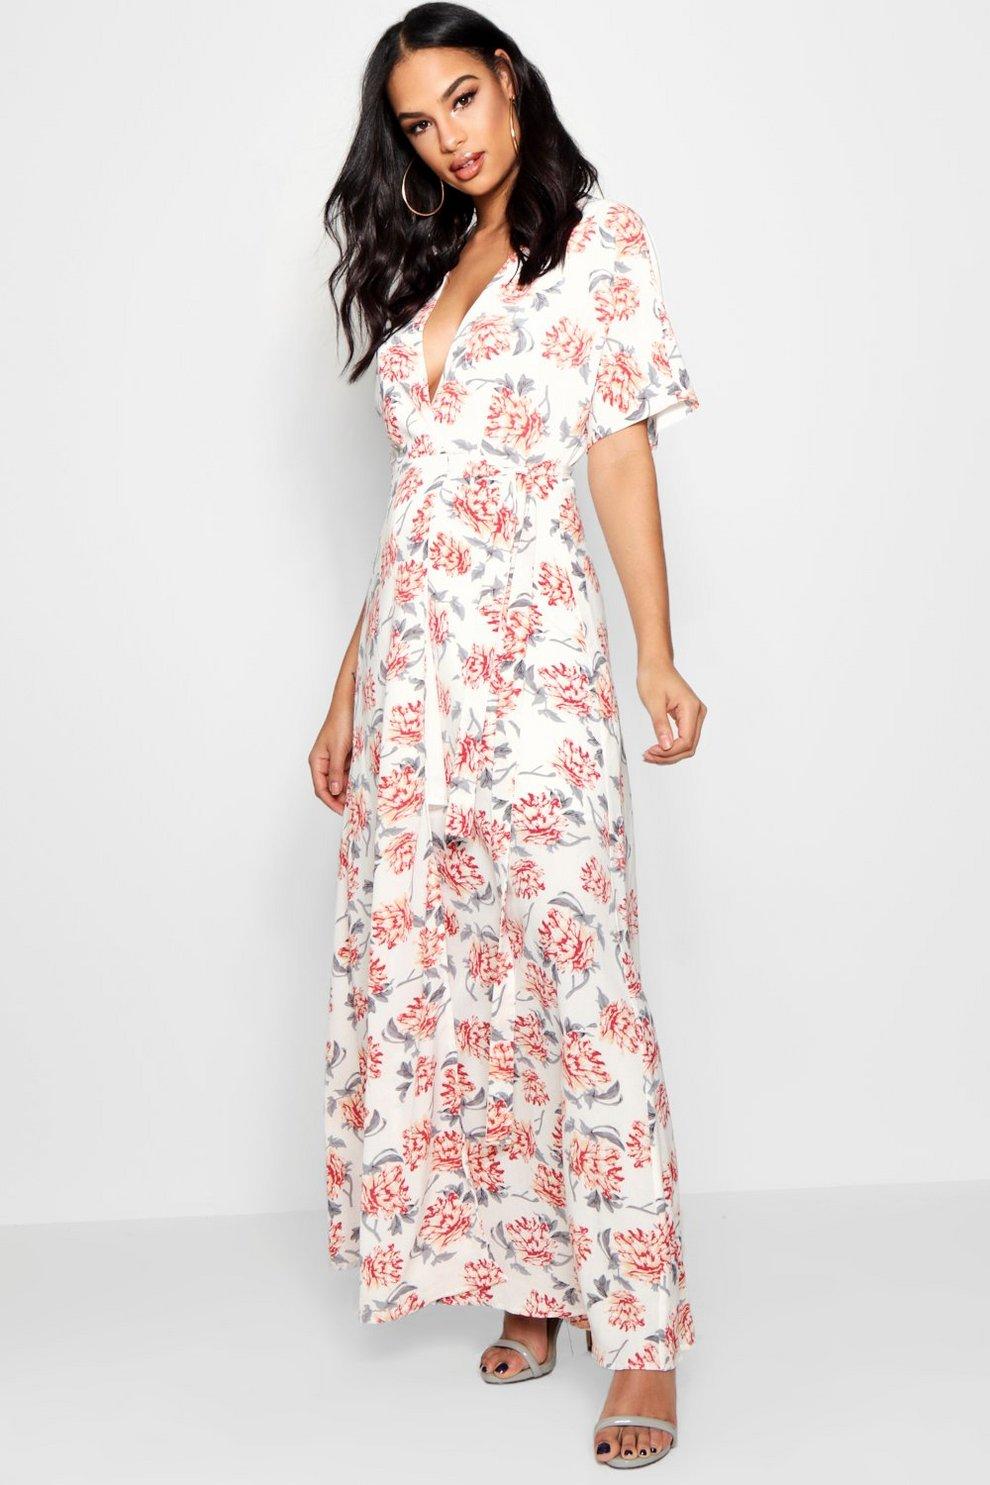 a4dcee956df9 Boutique Floral Kimono Sleeve Maxi Dress